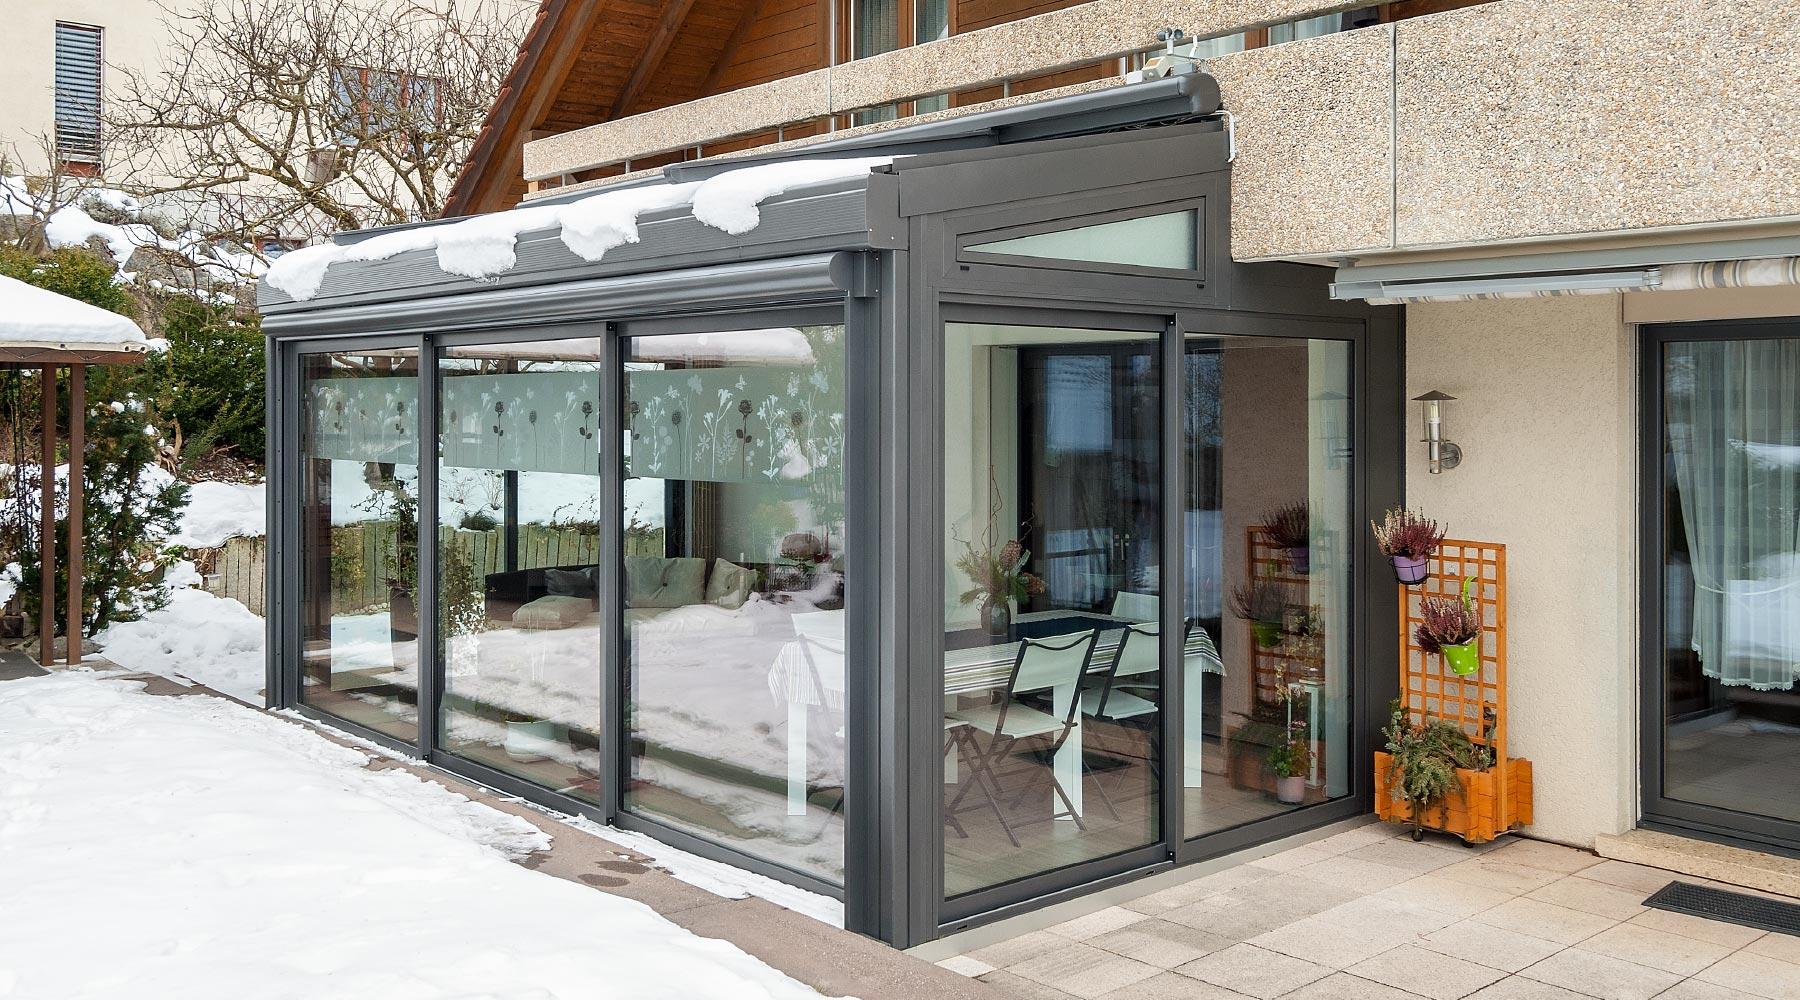 wintergarten unter balkon bauen balkon aus holz selber. Black Bedroom Furniture Sets. Home Design Ideas